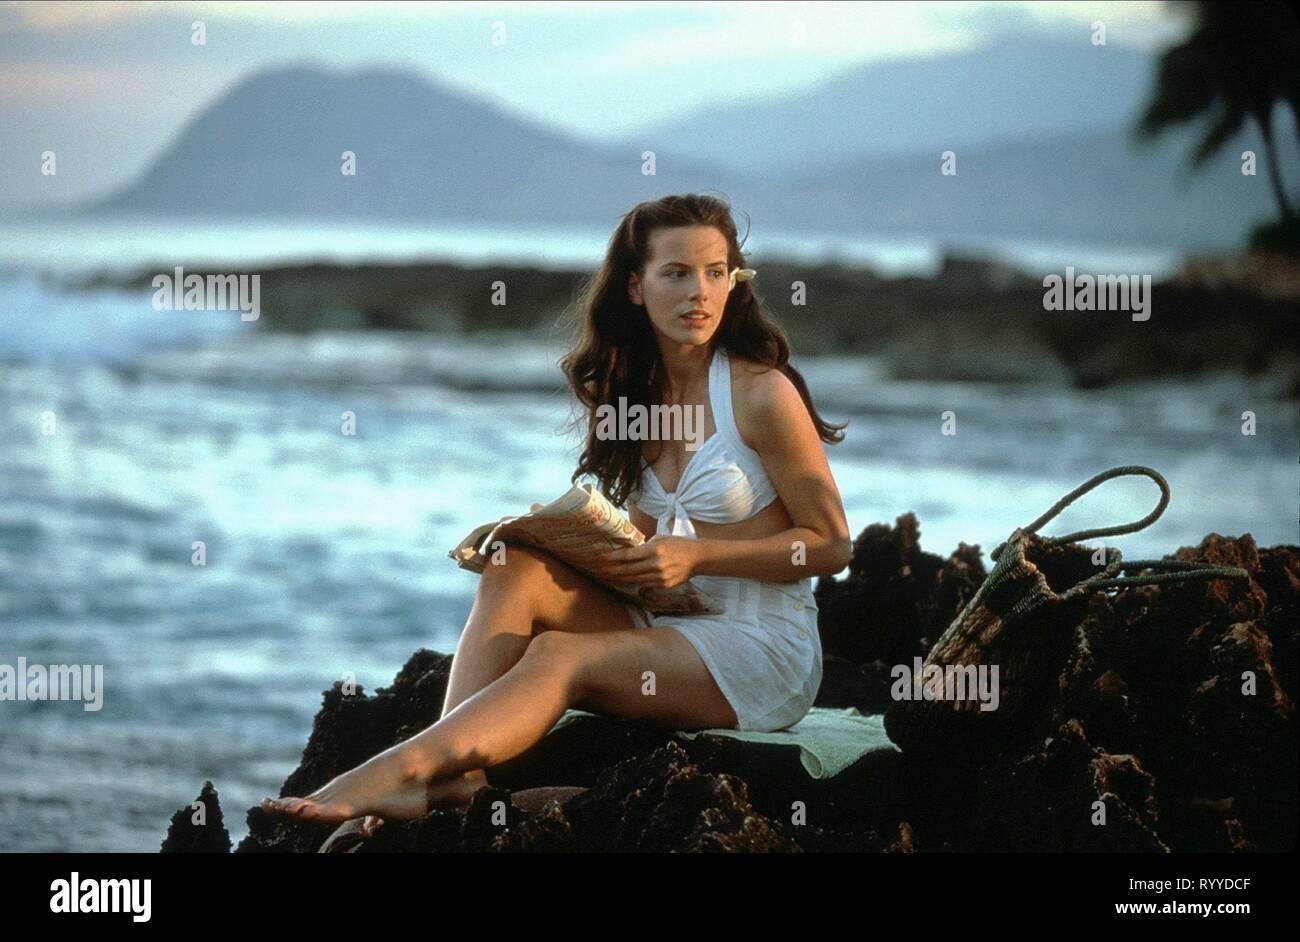 Kate Beckinsale Pearl Harbor 2001 Stock Photo Alamy